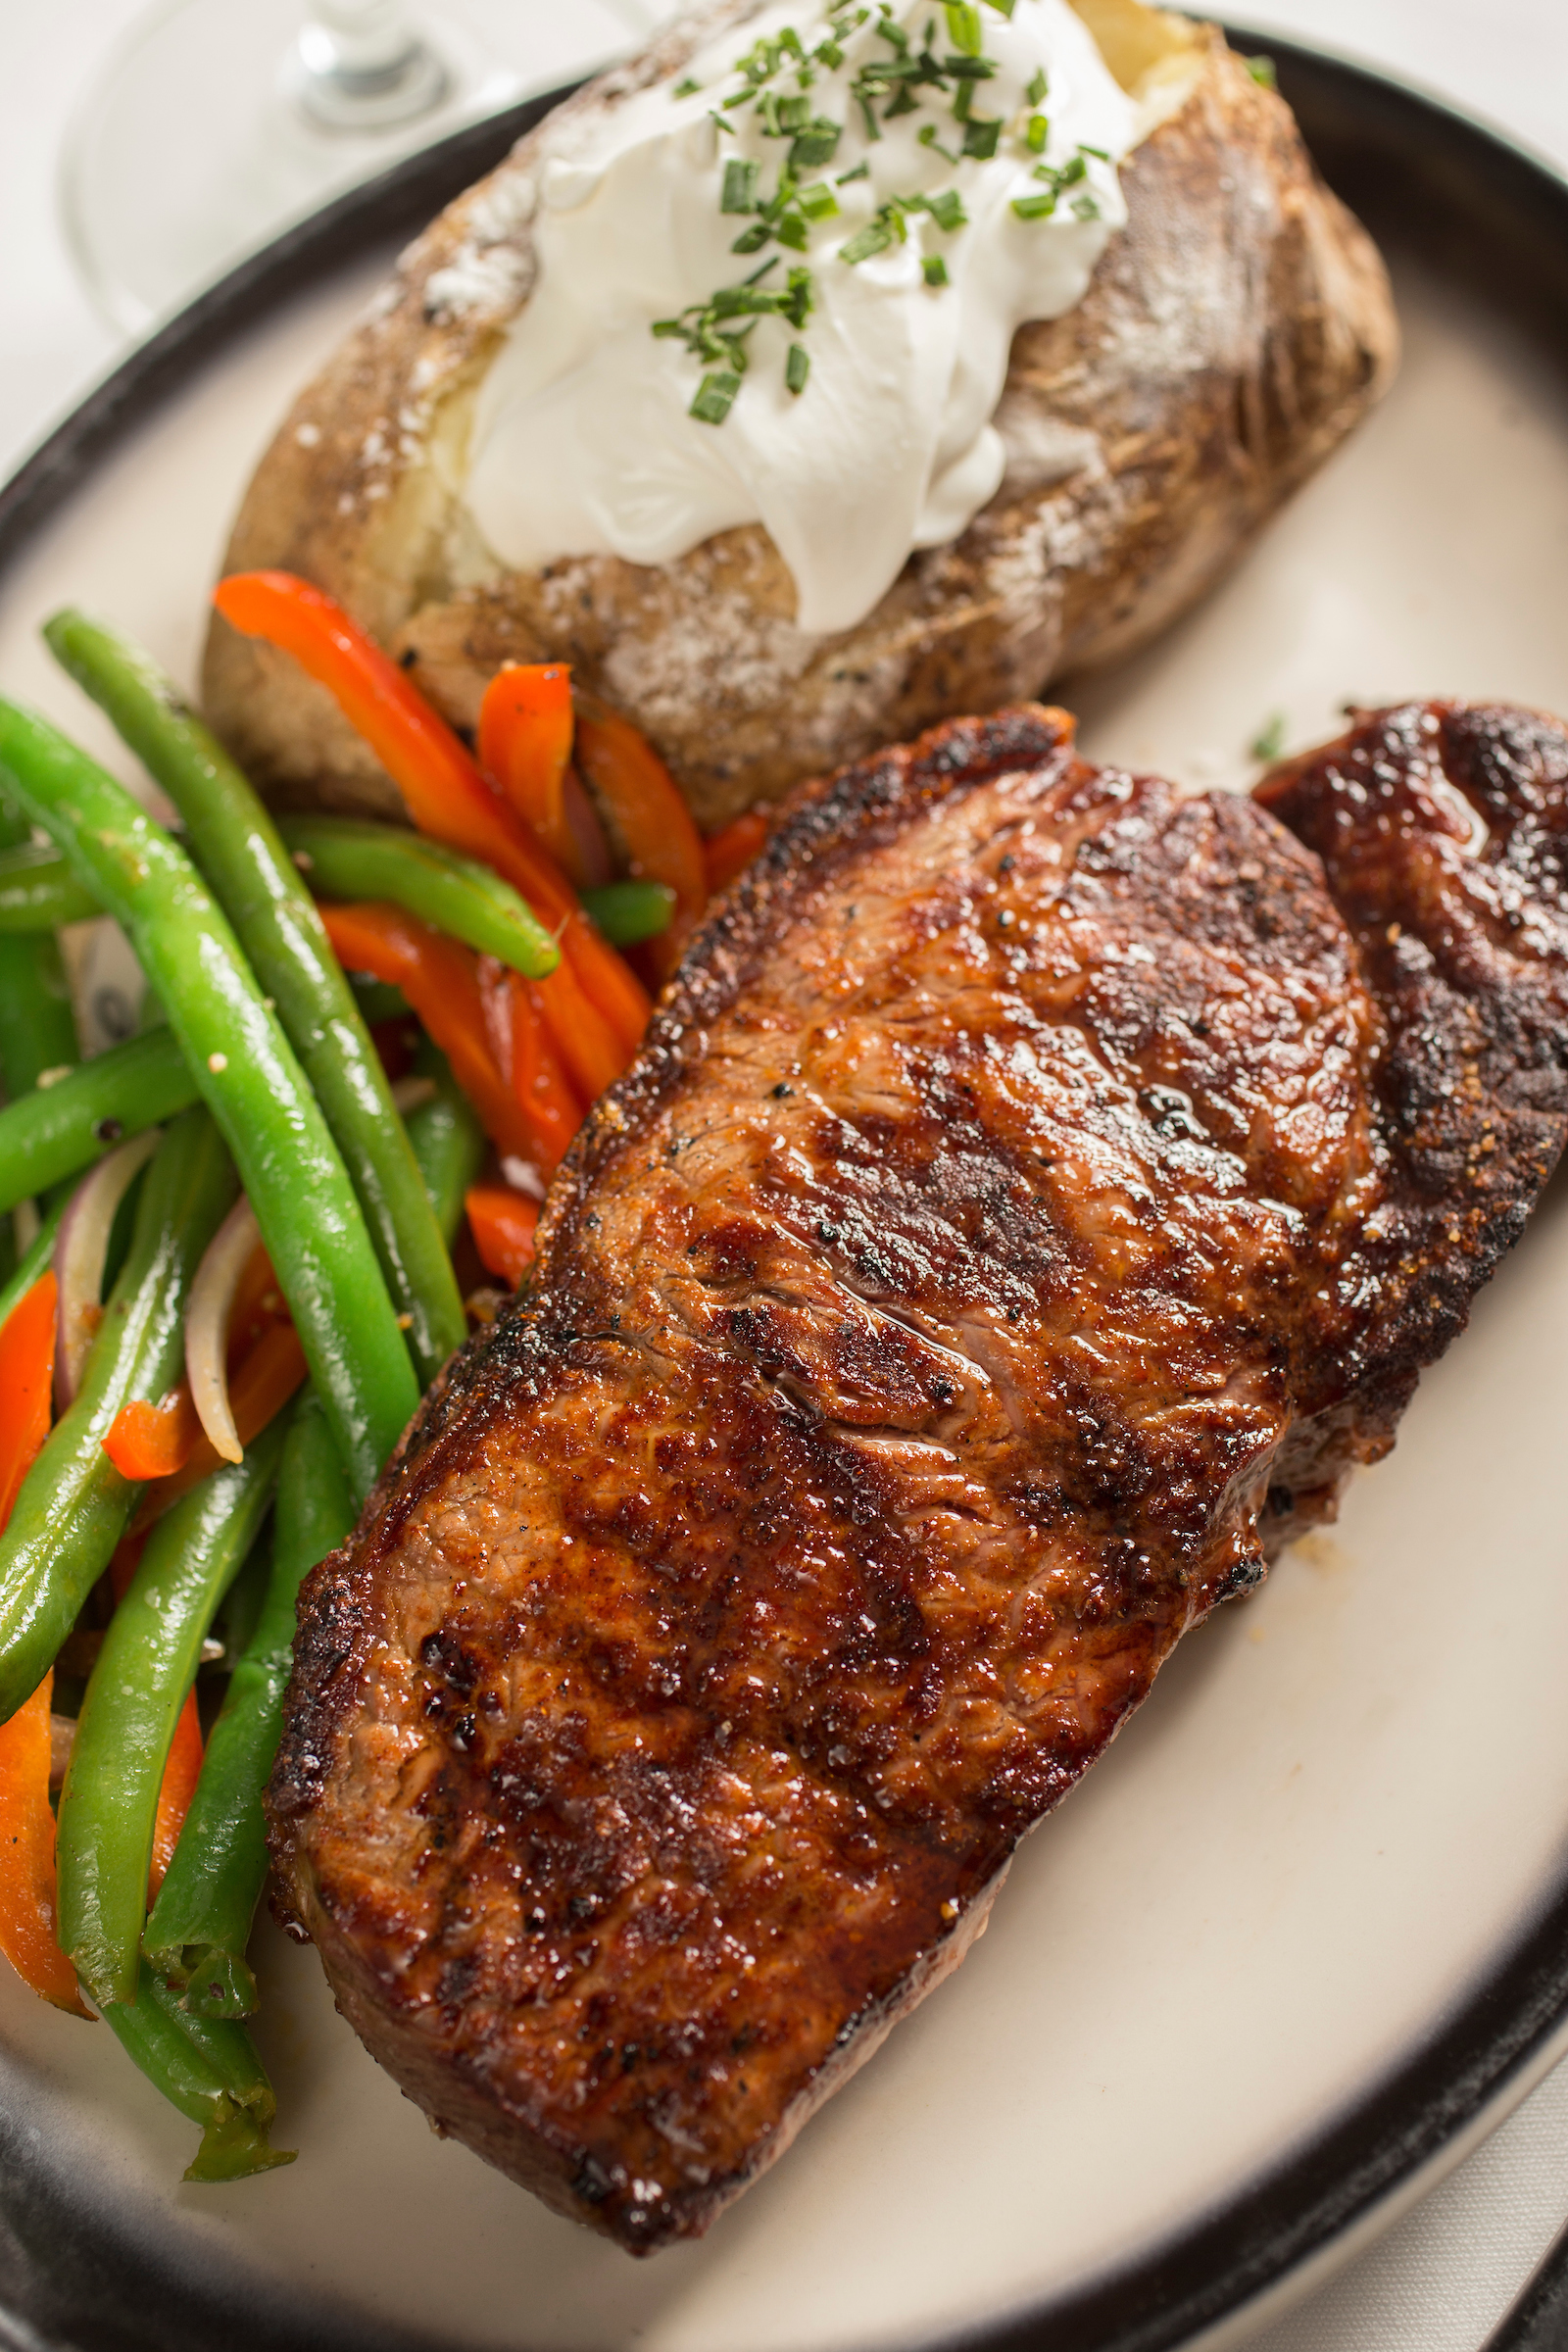 The Top Steakhouse steak